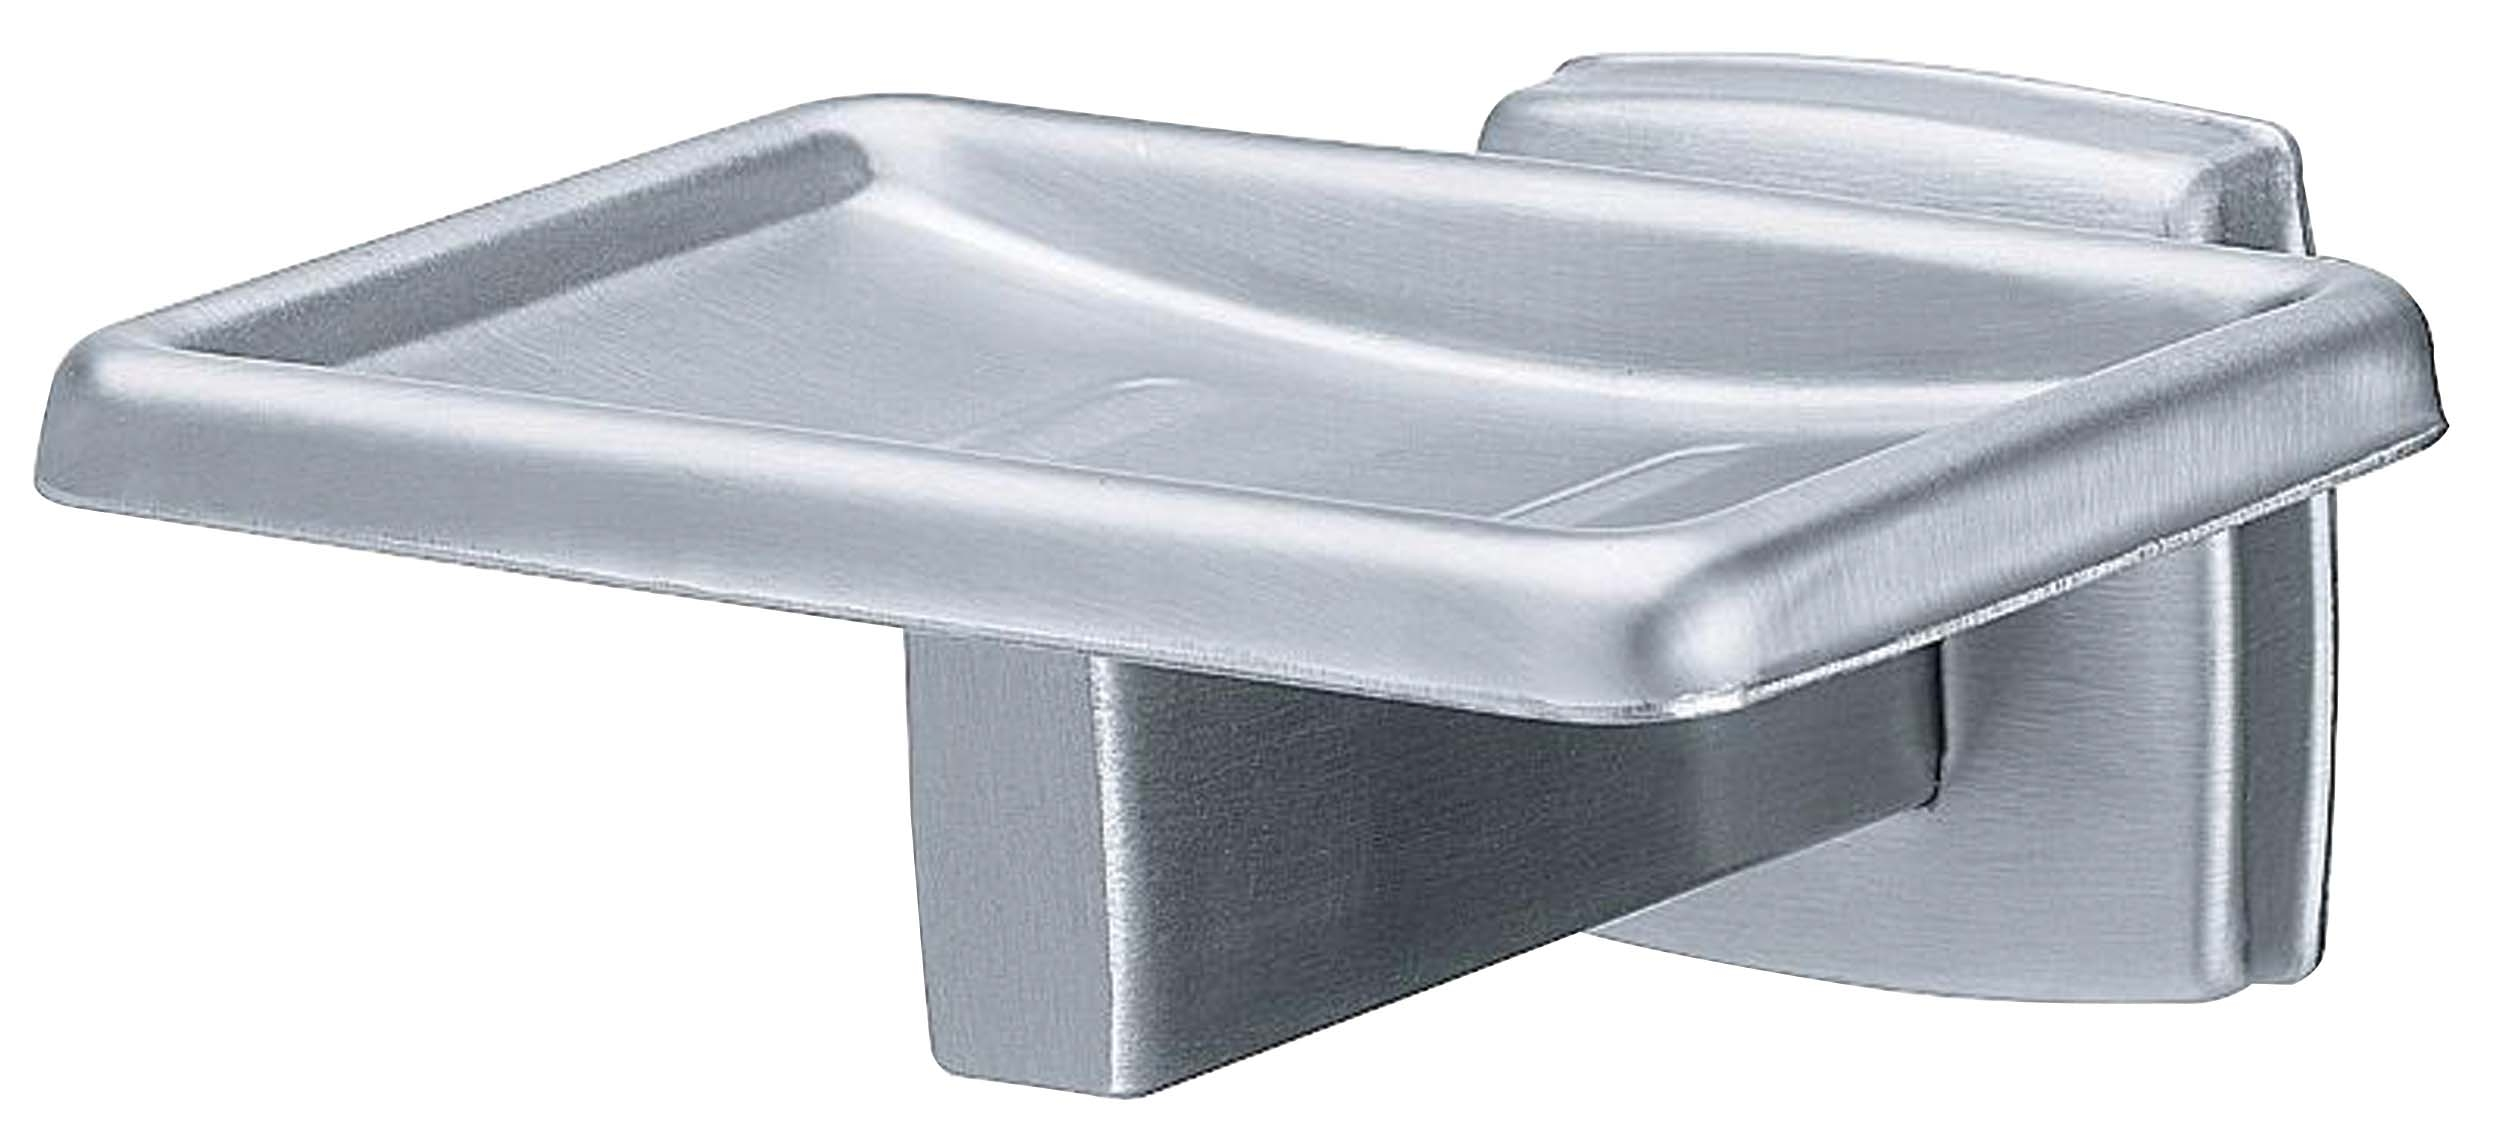 Bradley 9014-63 Satin Stainless Steel Soap Dish